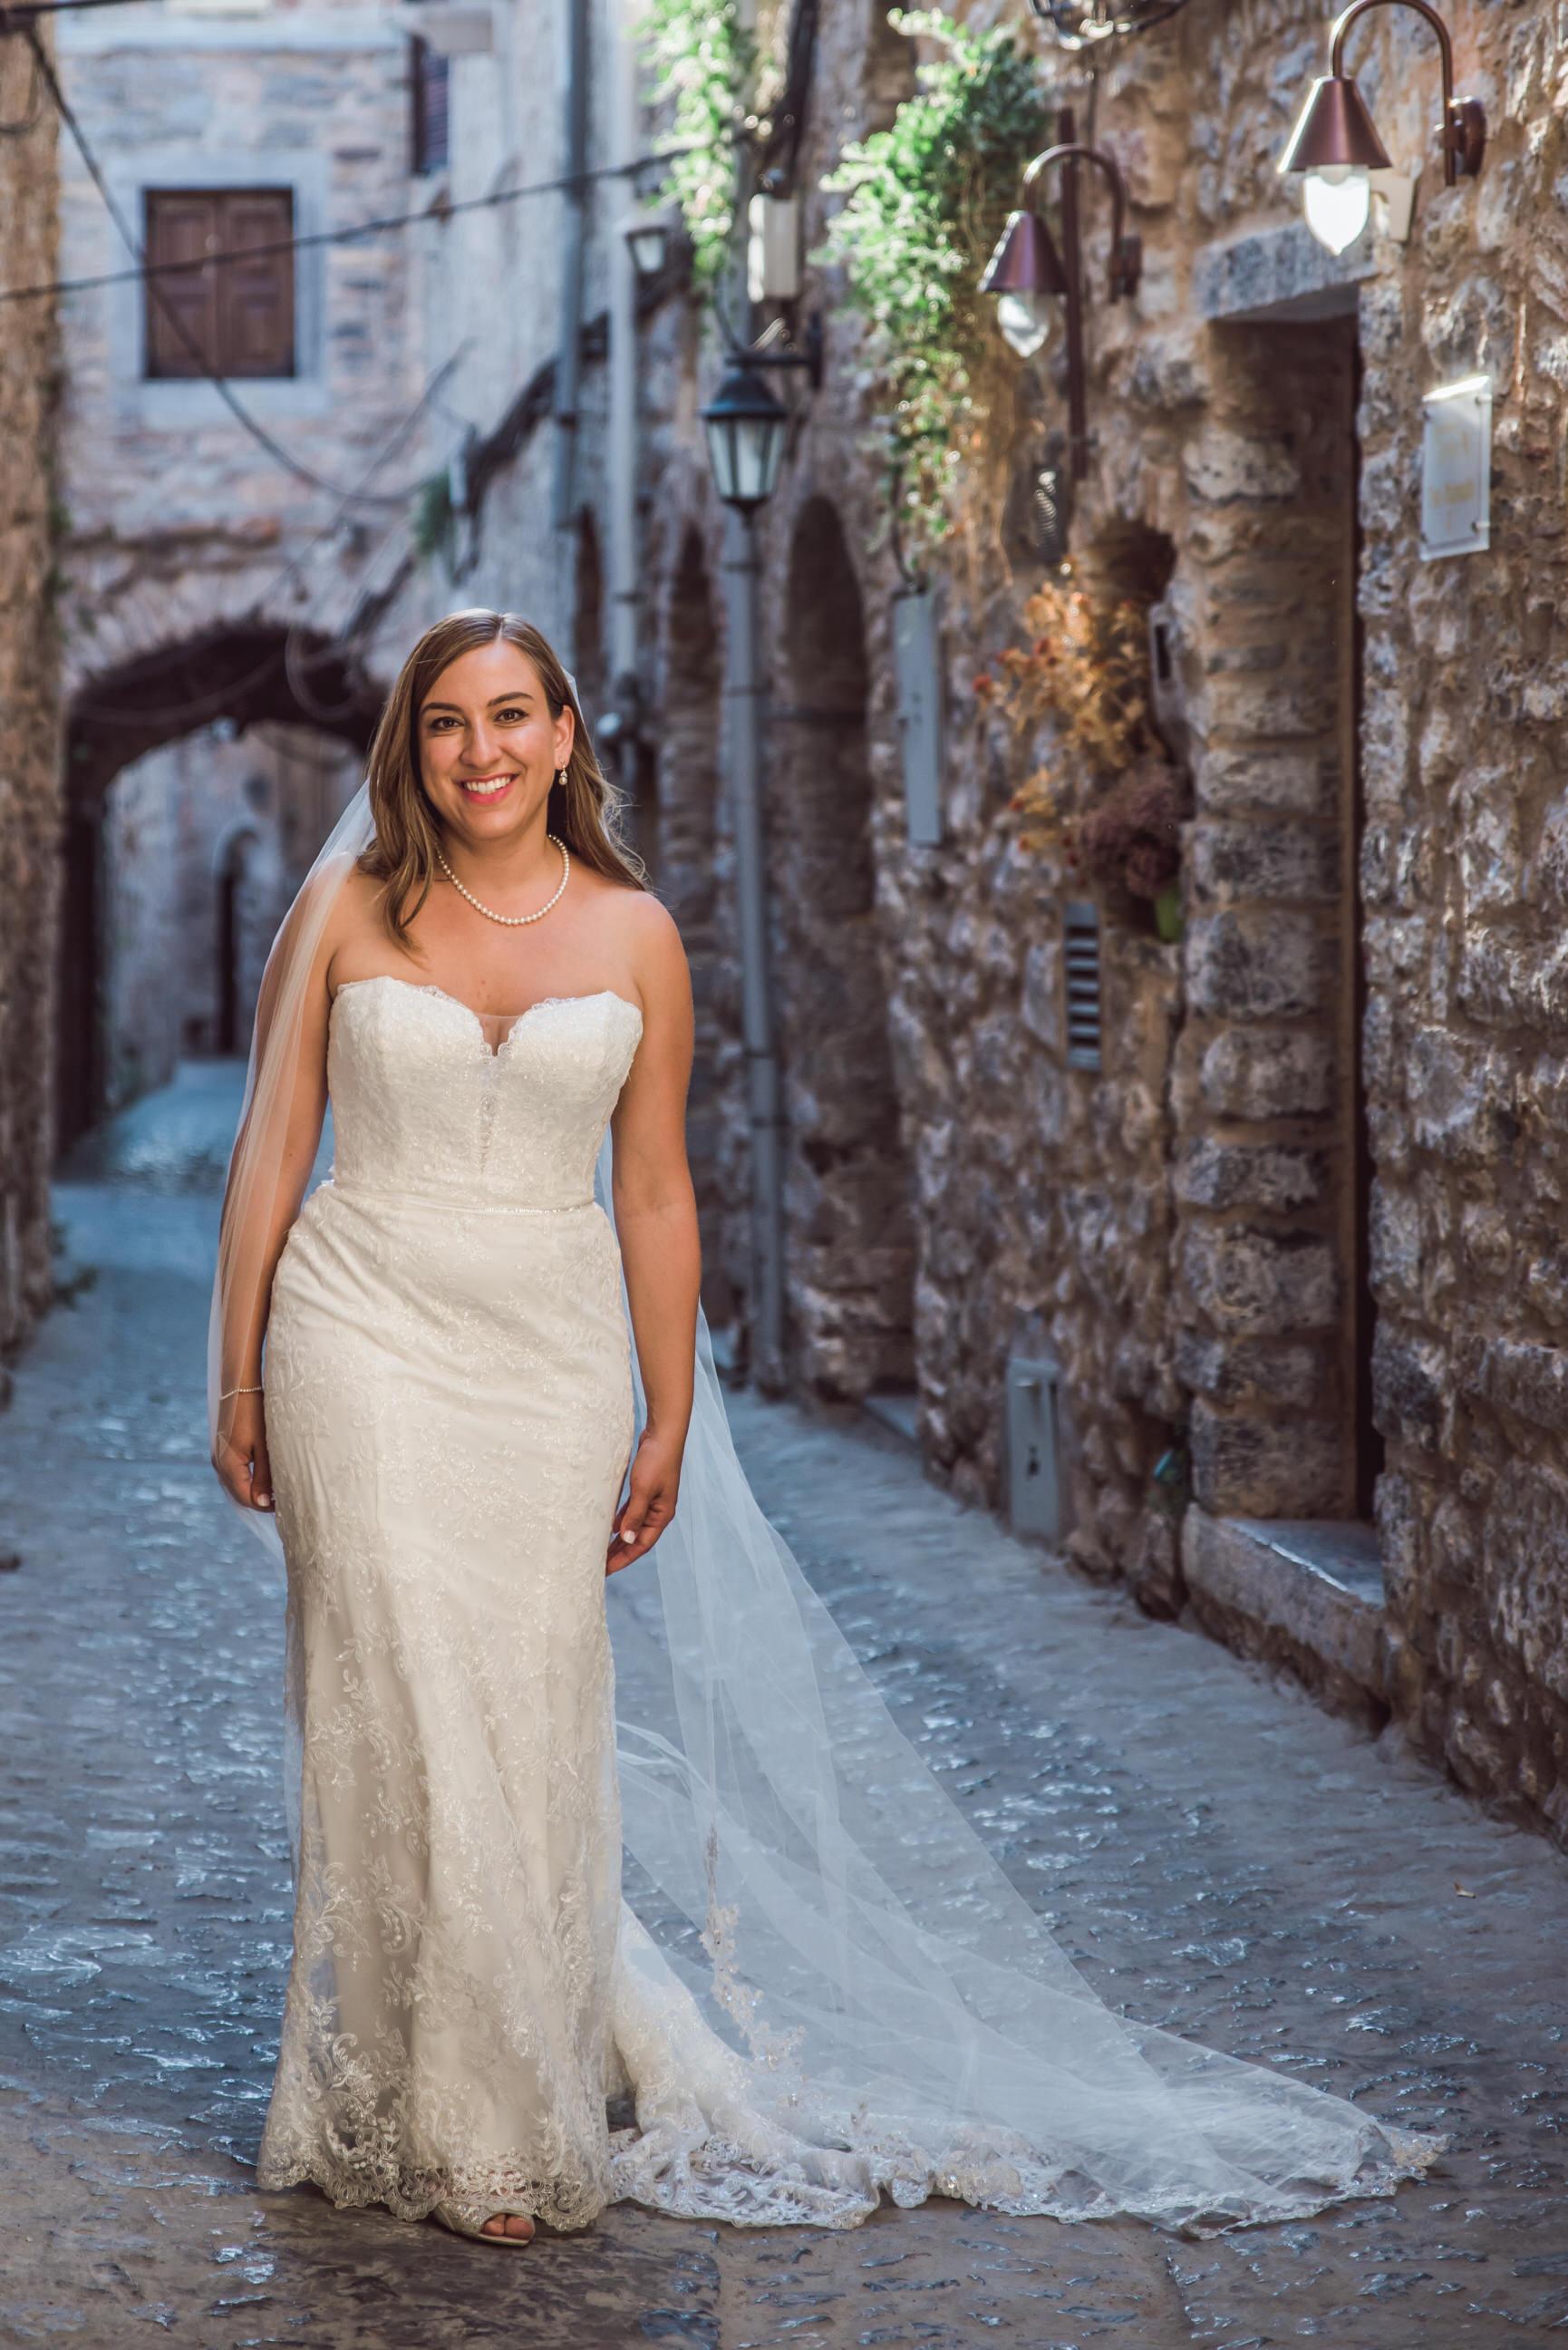 GreeceWedding-Tricia&Will-DayAfter-161.jpg